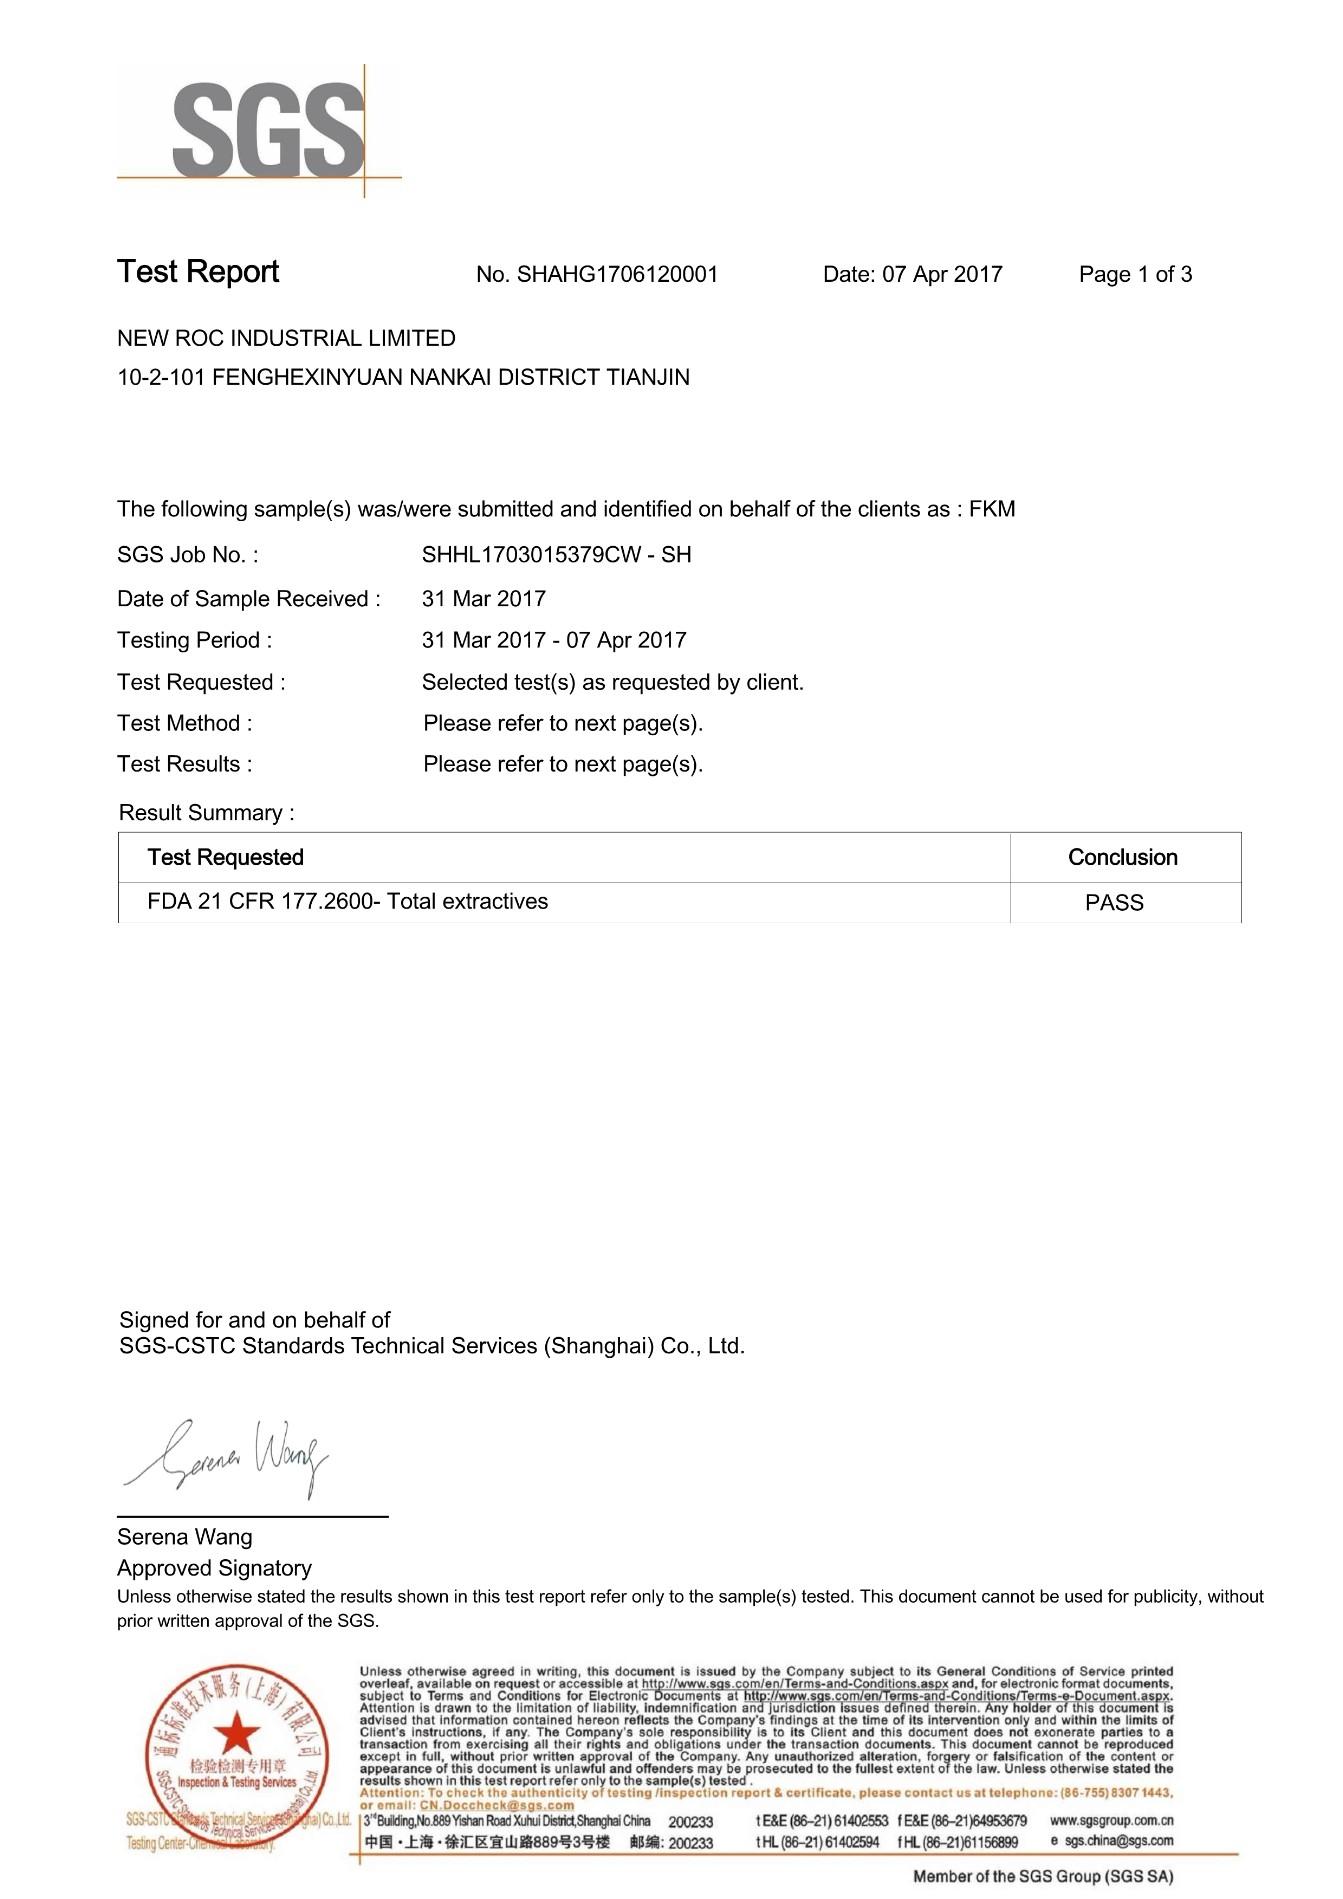 FDA certification for FKM